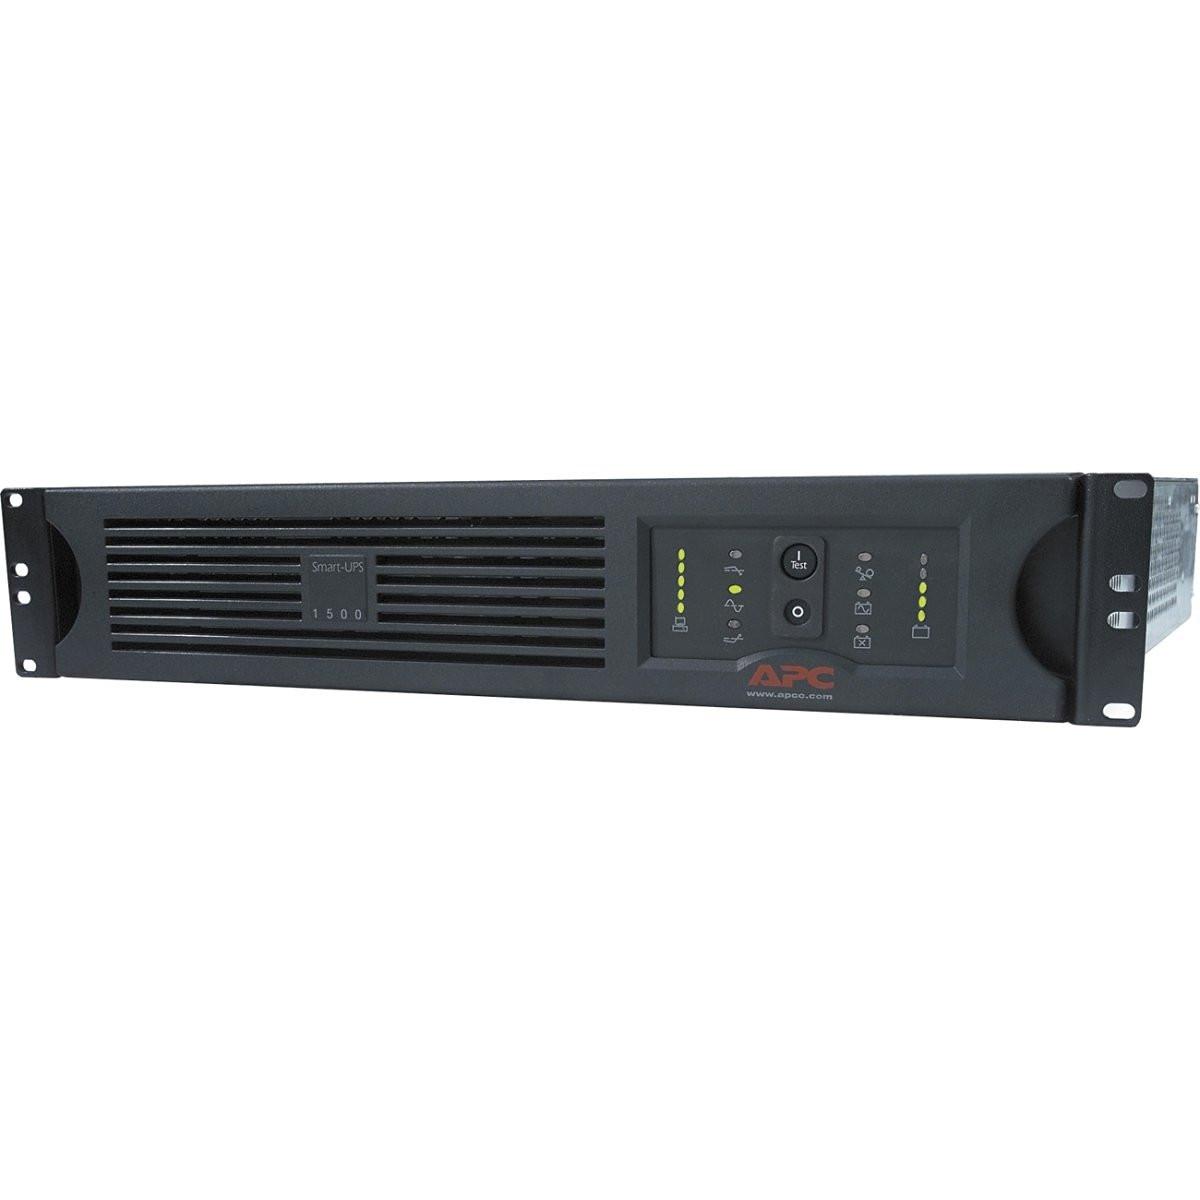 APC Smart-UPS 1500VA USB & Serial RM 2U 120V SUA1500RM2U - front view